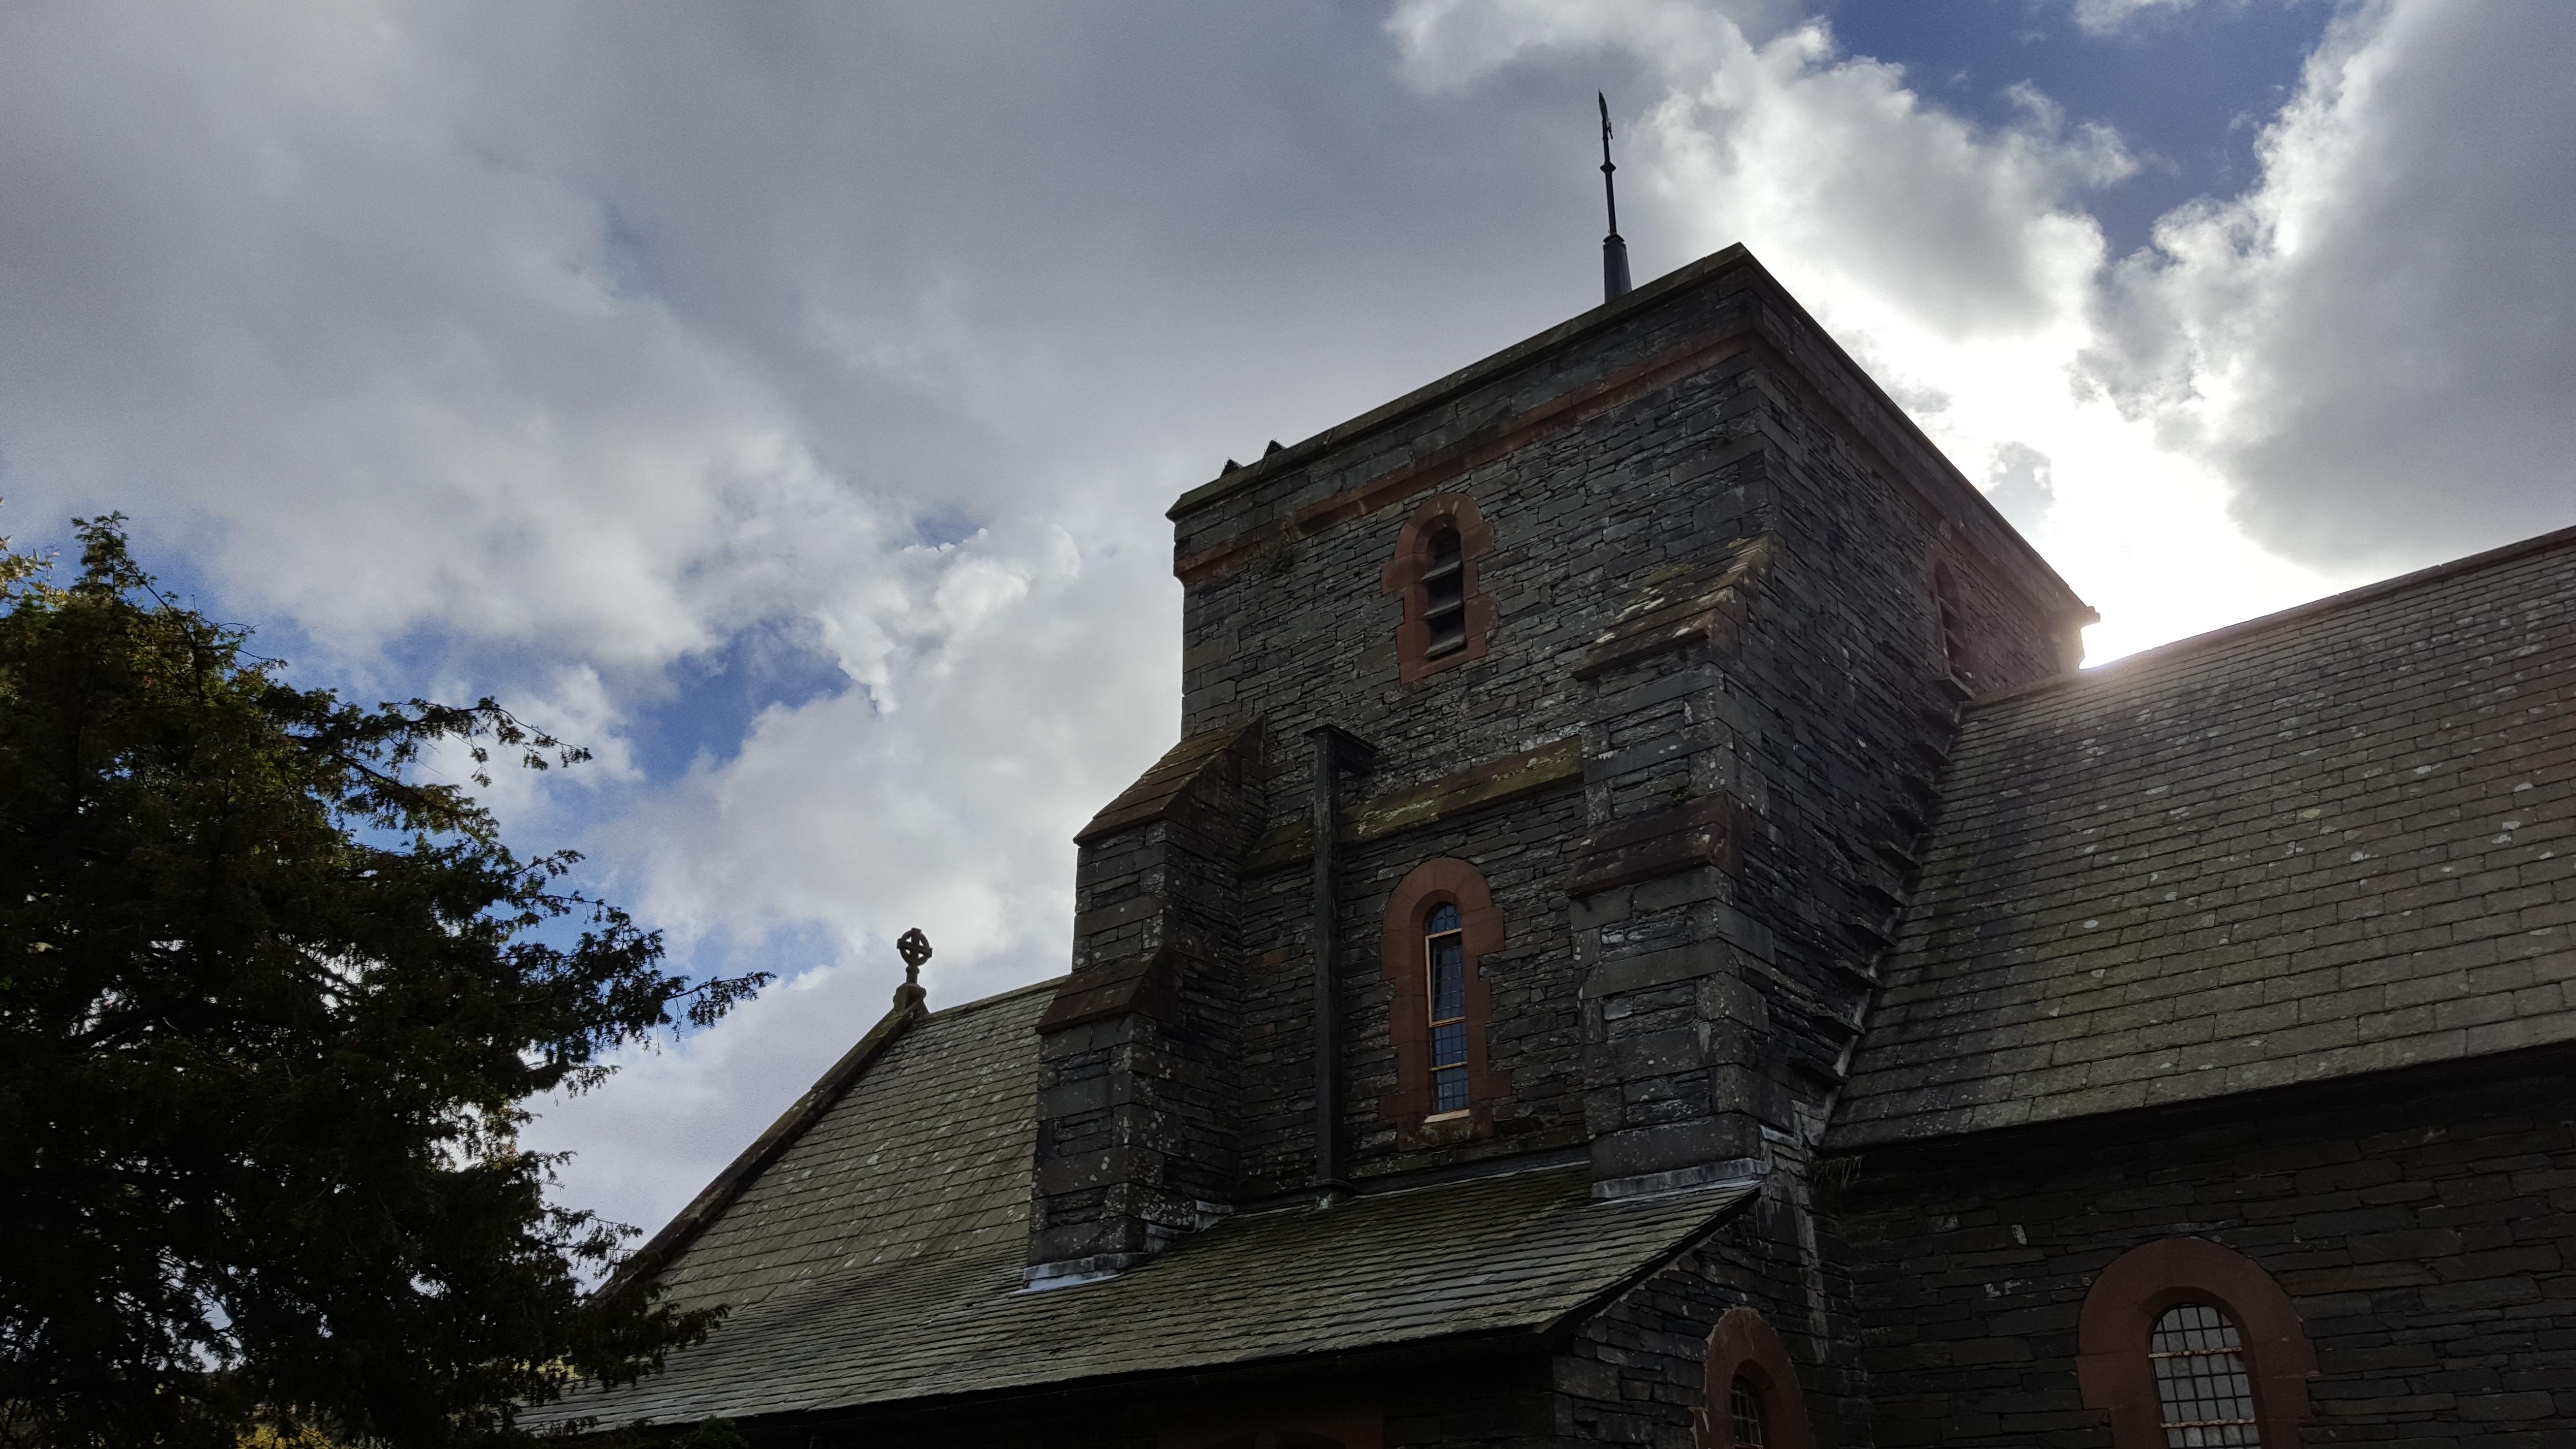 Torver village history